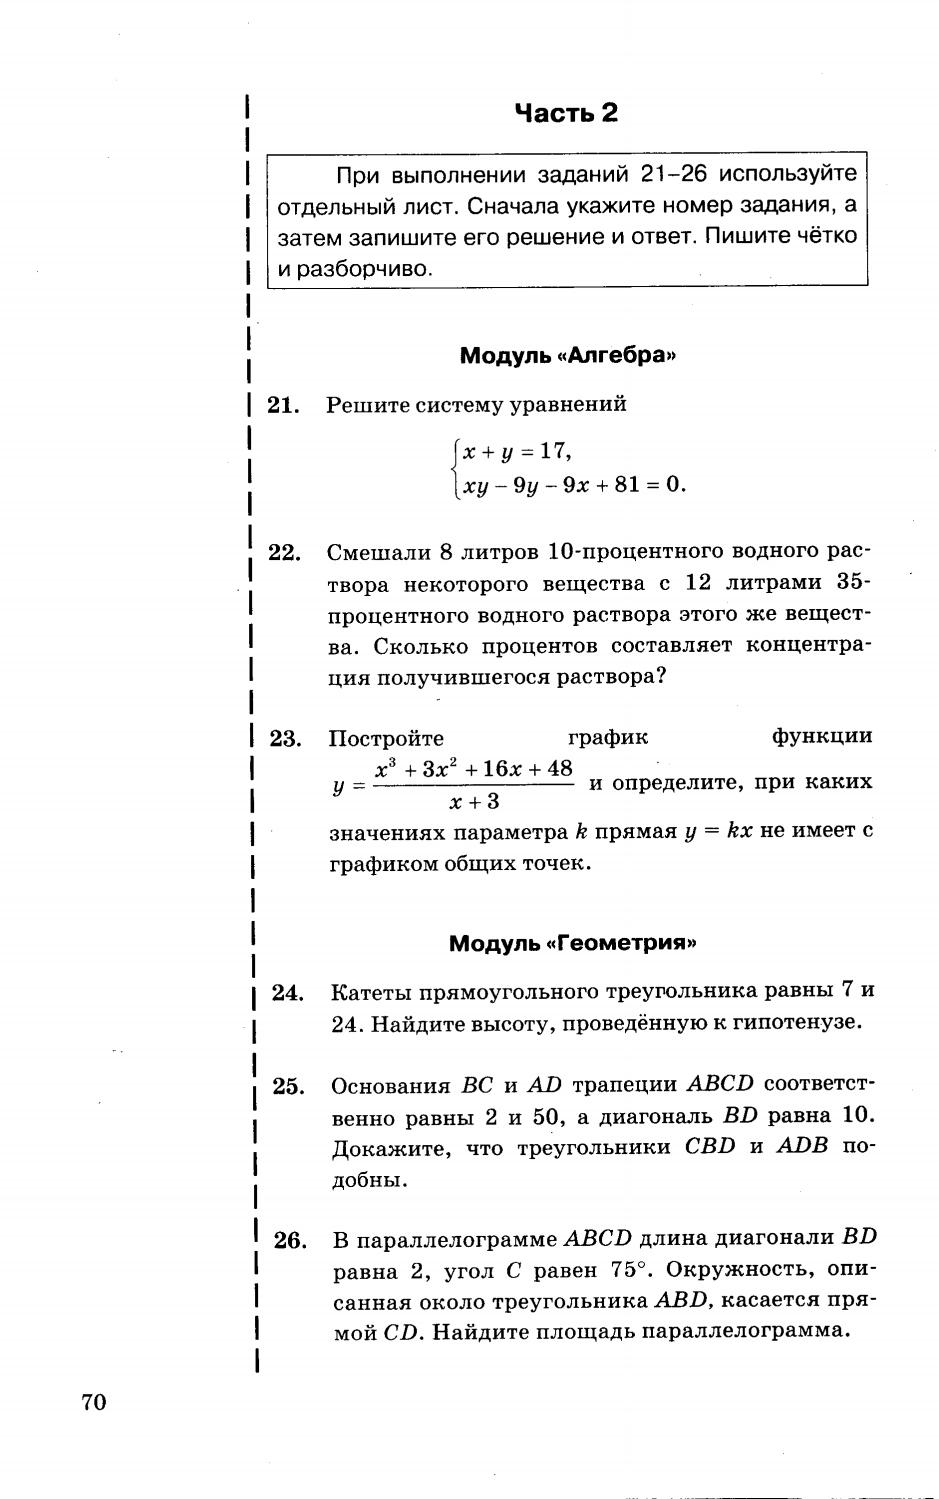 https://docs.google.com/viewer?pid=explorer&srcid=0Bw_f54pvrxEtbldKNGgyaFE3TDg&chrome=false&docid=e803bf4555b2fe7a8e01072ad16bc93b%7Cc9acad21277b9c8c76d1236b5bcea6e2&a=bi&pagenumber=71&w=939